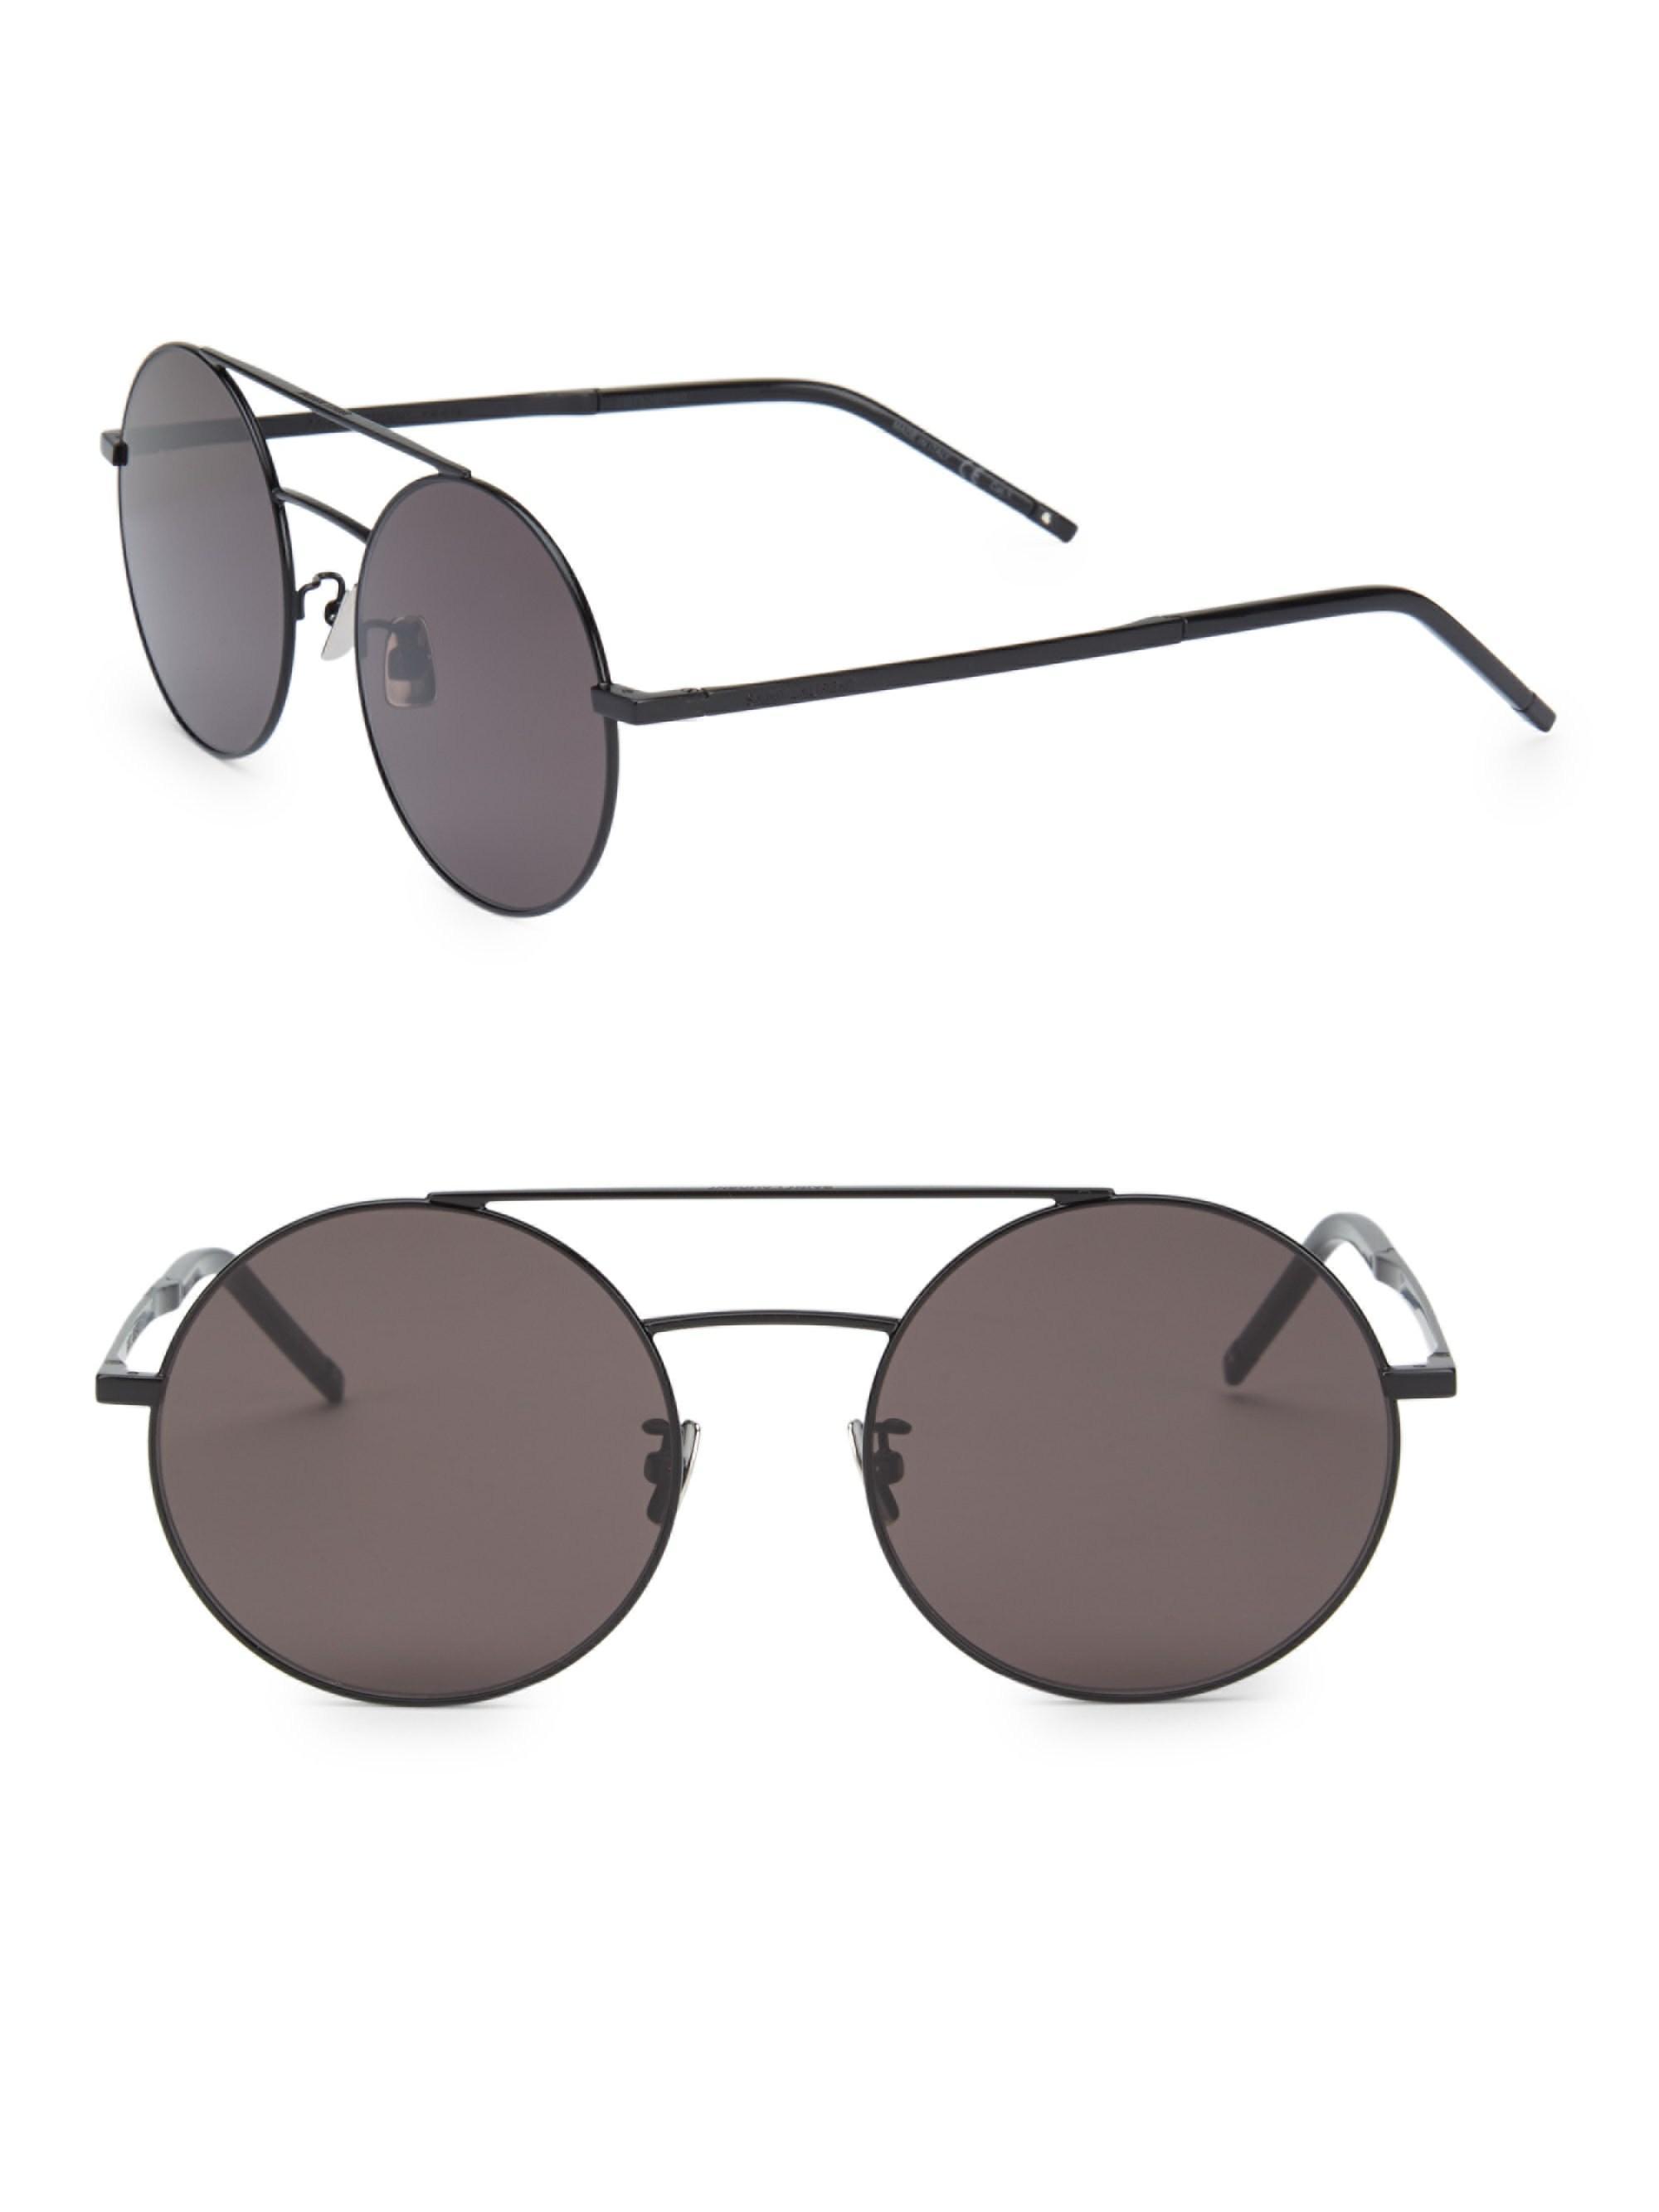 5c61d4bdf74c Lyst - Saint Laurent 56mm Aviator Sunglasses in Black for Men